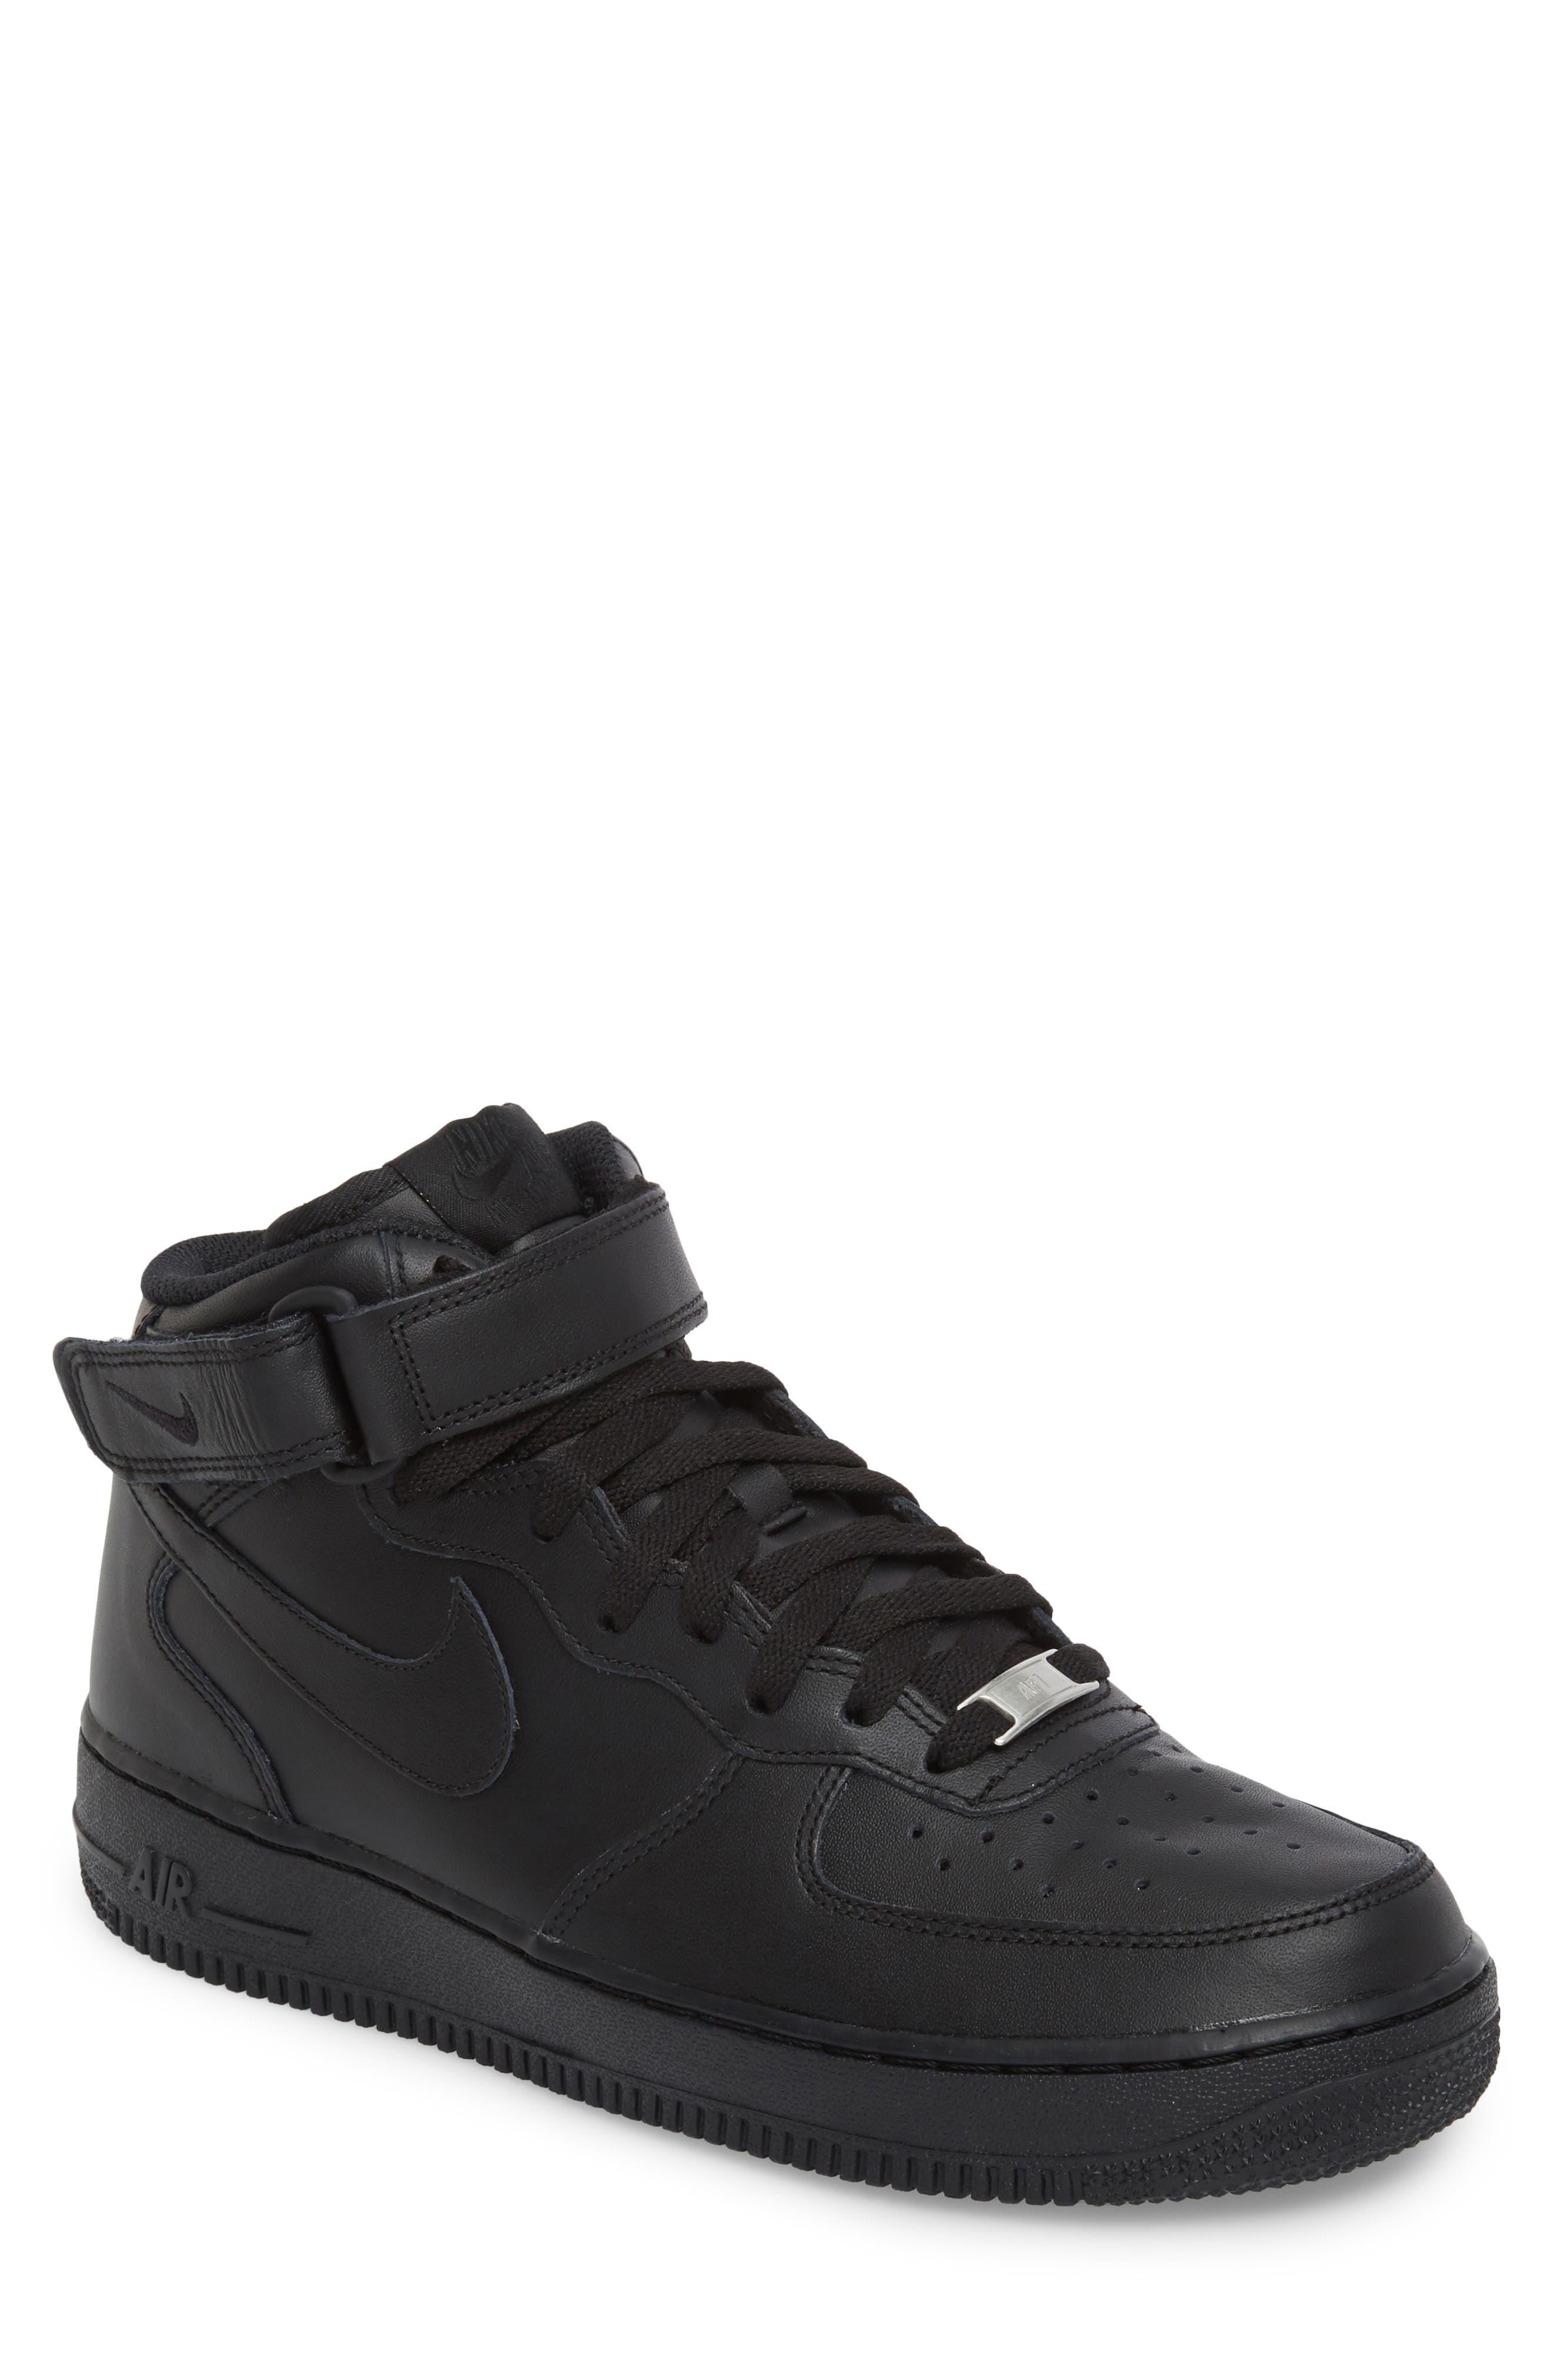 Air Force 1 Mid '07 Sneaker,                             Main thumbnail 1, color,                             BLACK/ BLACK